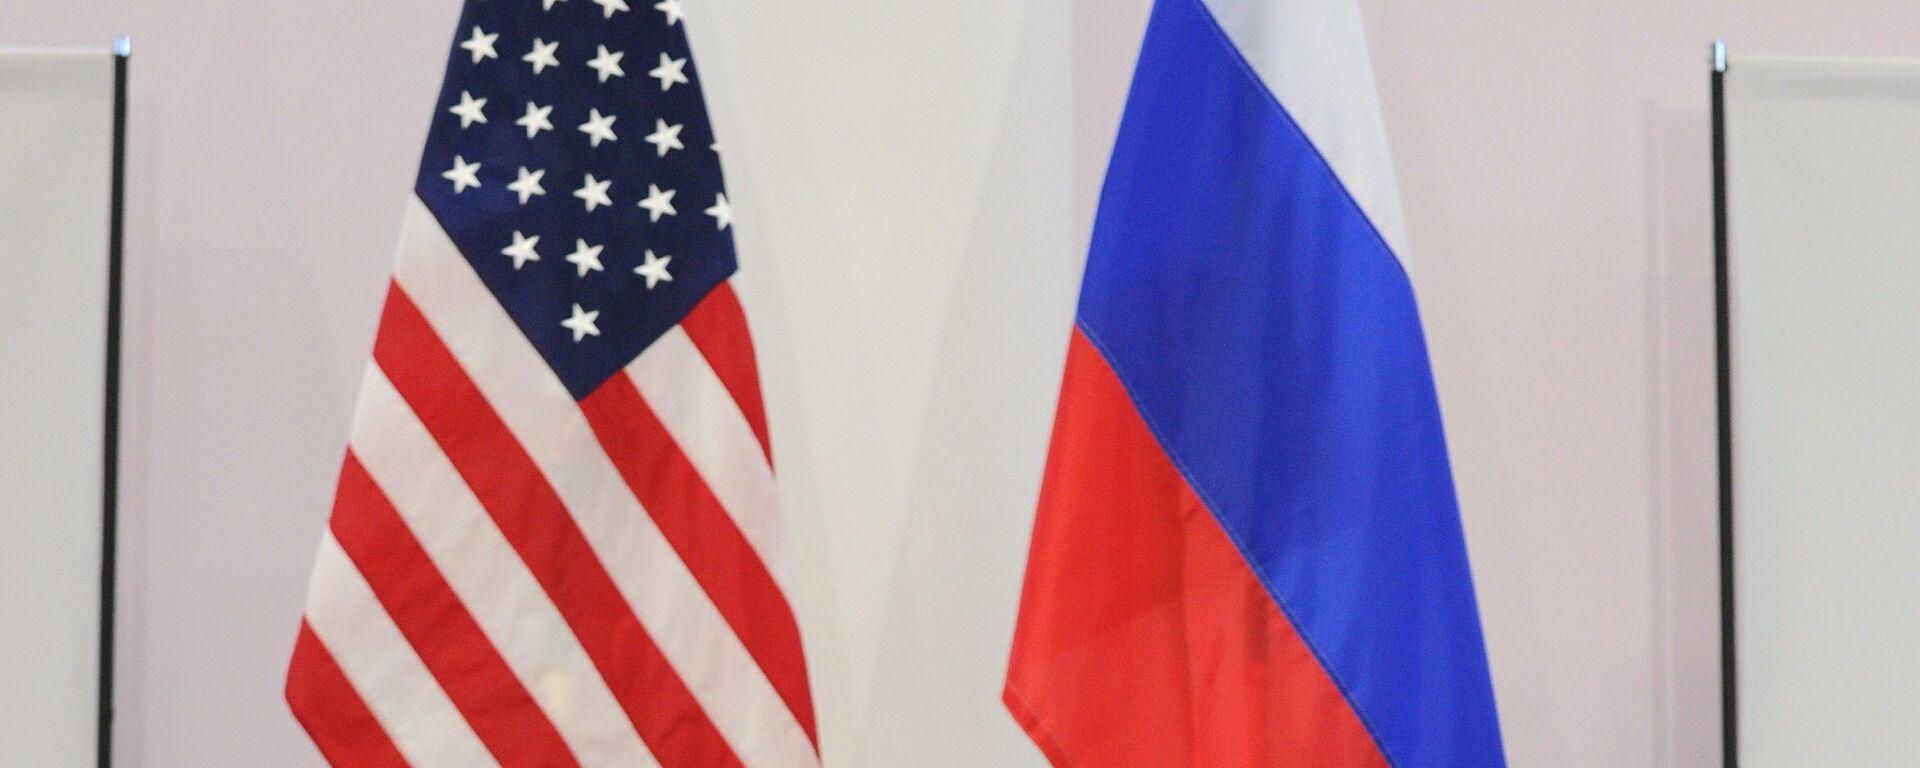 US and Russian flags - Sputnik Mundo, 1920, 15.04.2021